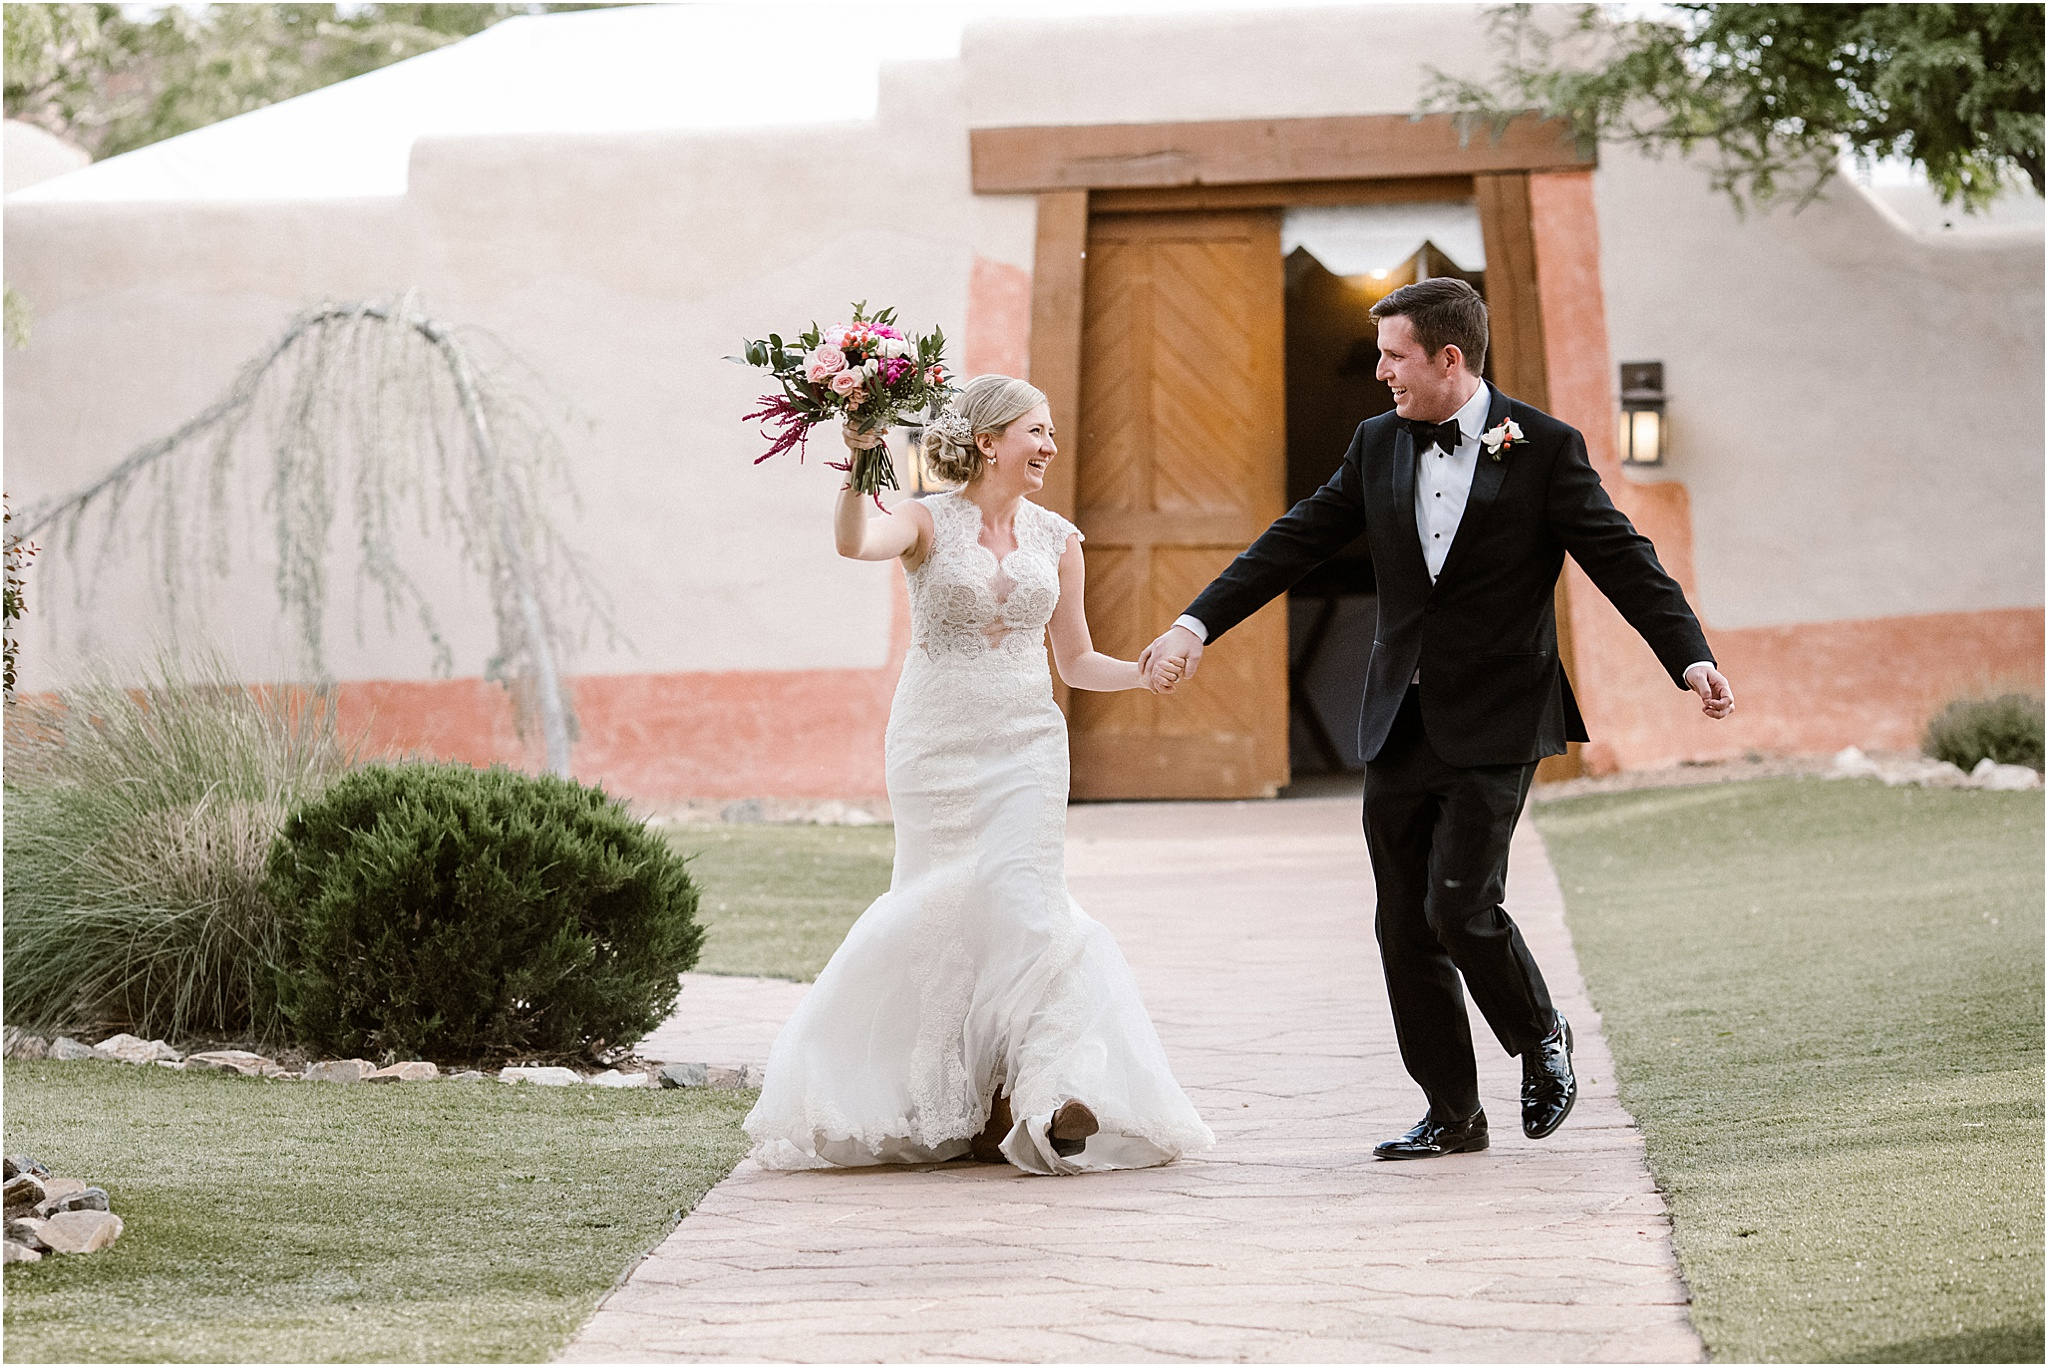 JENNA_JEROME_BLUE ROSE PHOTOGRAPHY_ABQ WEDDING_53